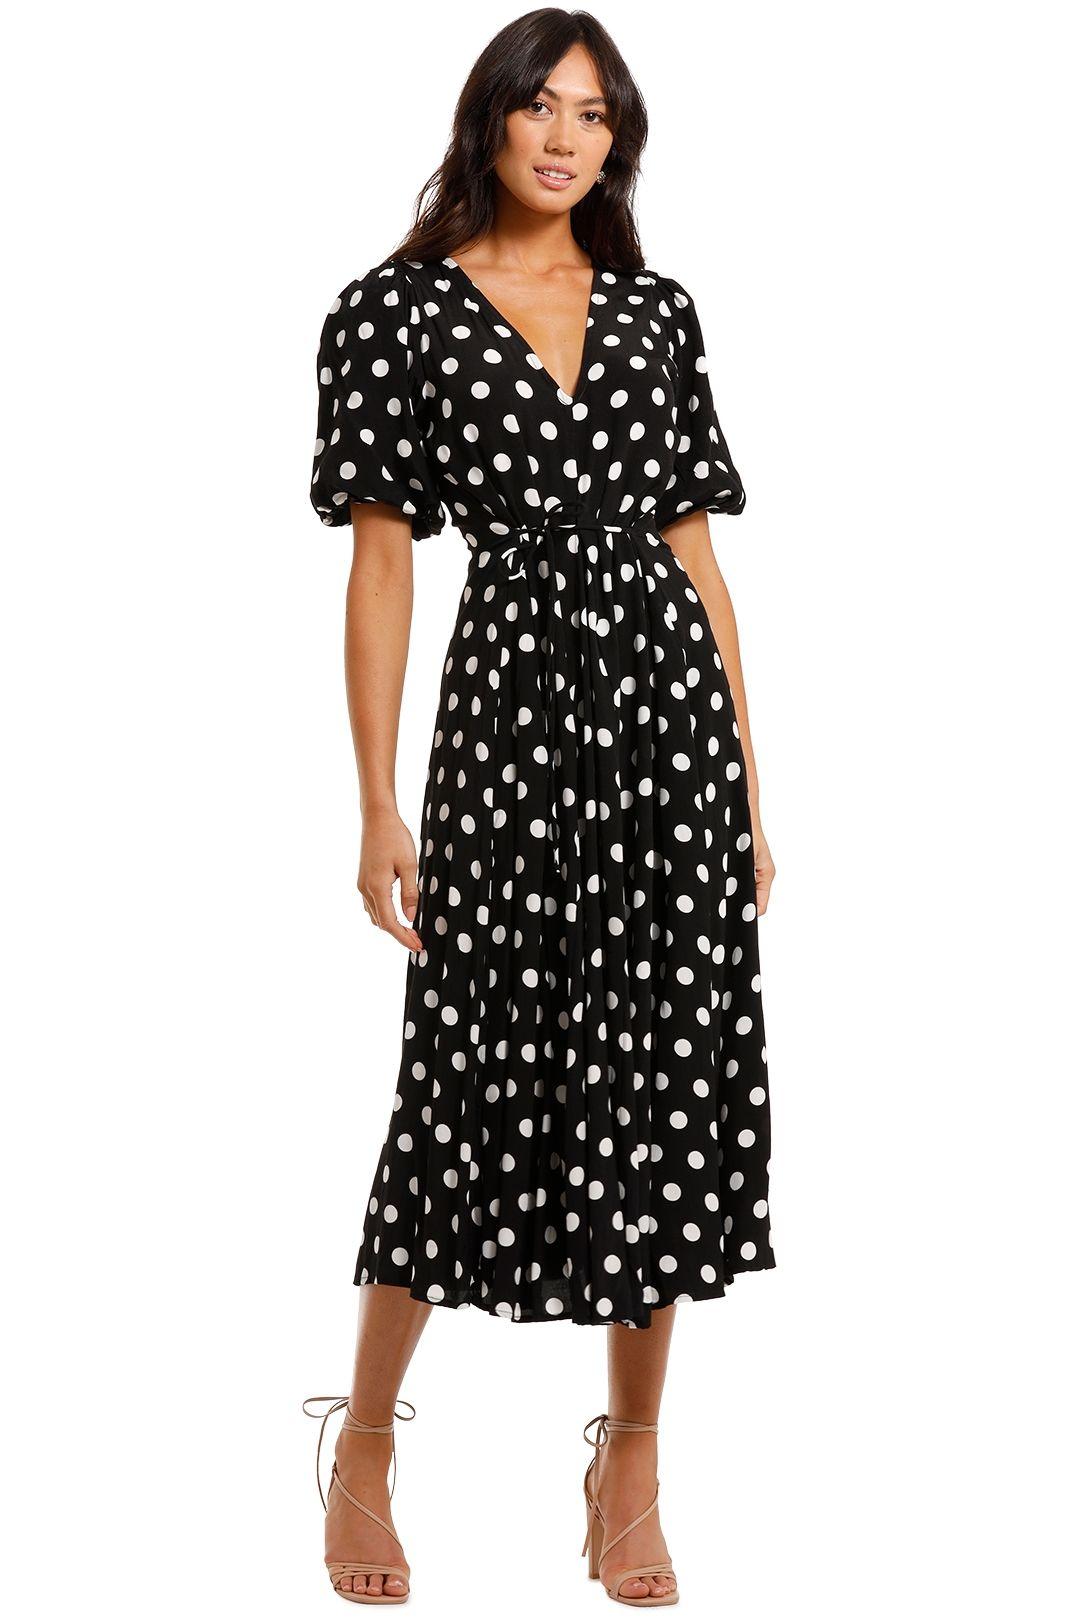 Faithfull La Torre Polka Midi Dress